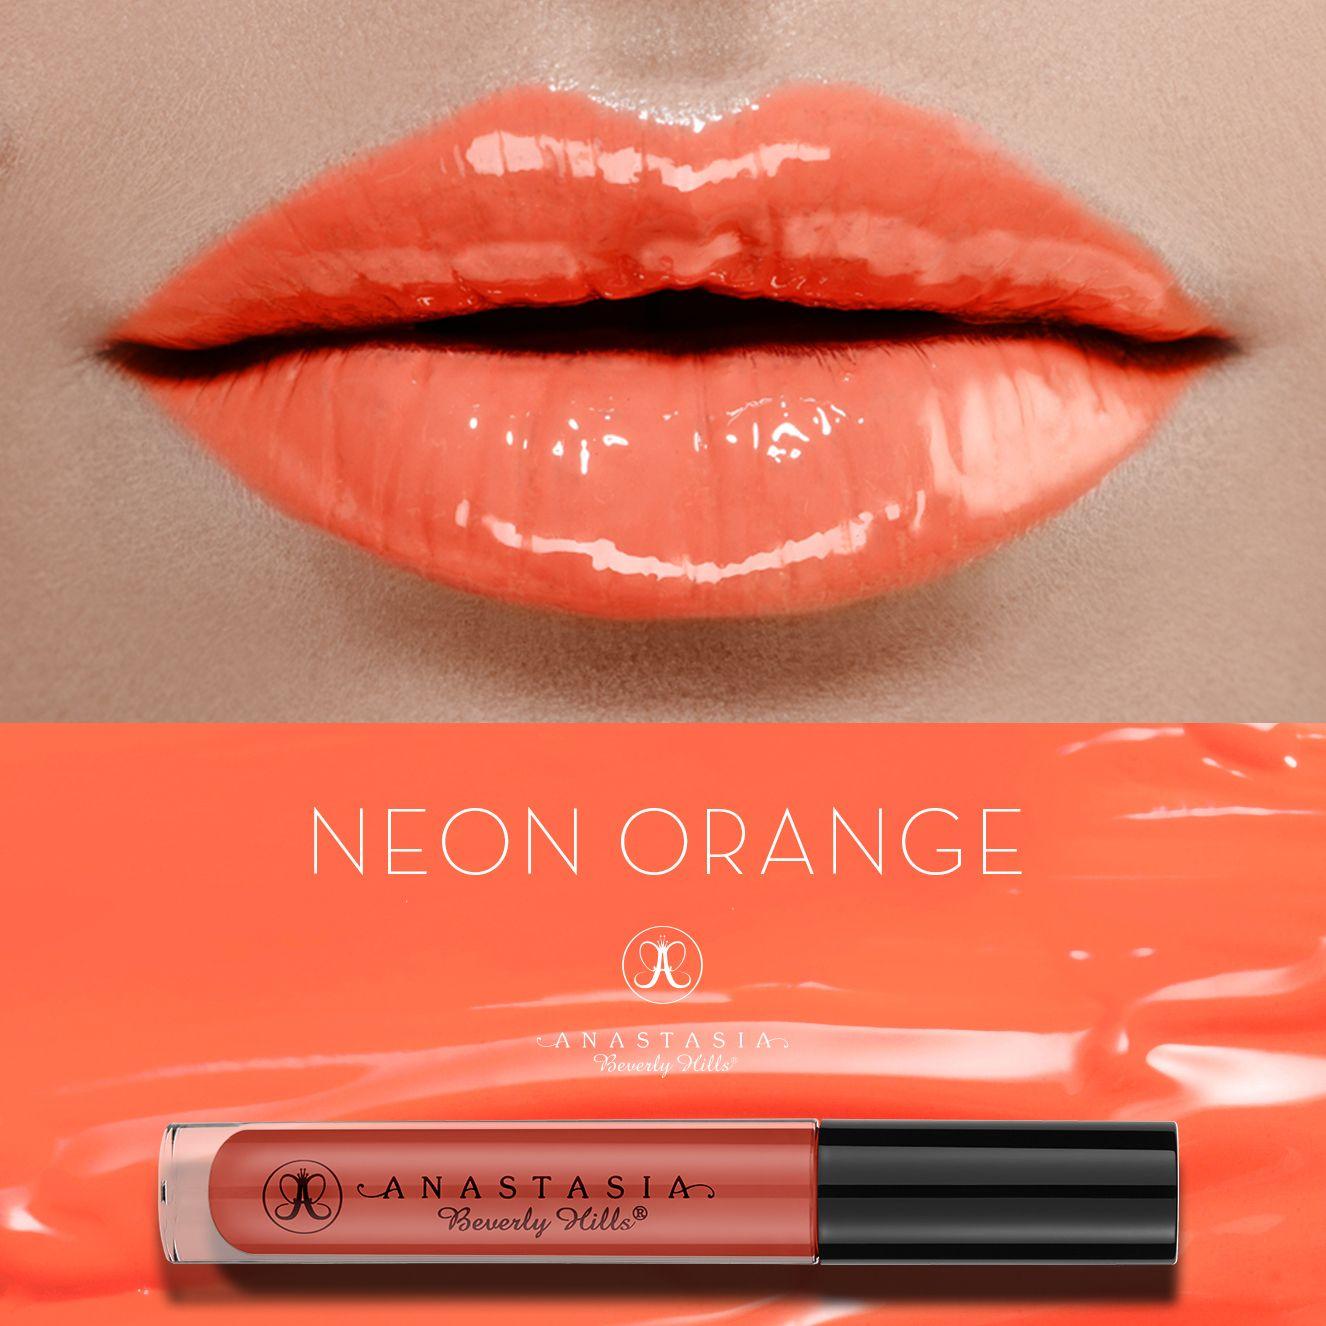 High Shine Lip Gloss Lip Glosses Orange Lips Lip Gloss Lips